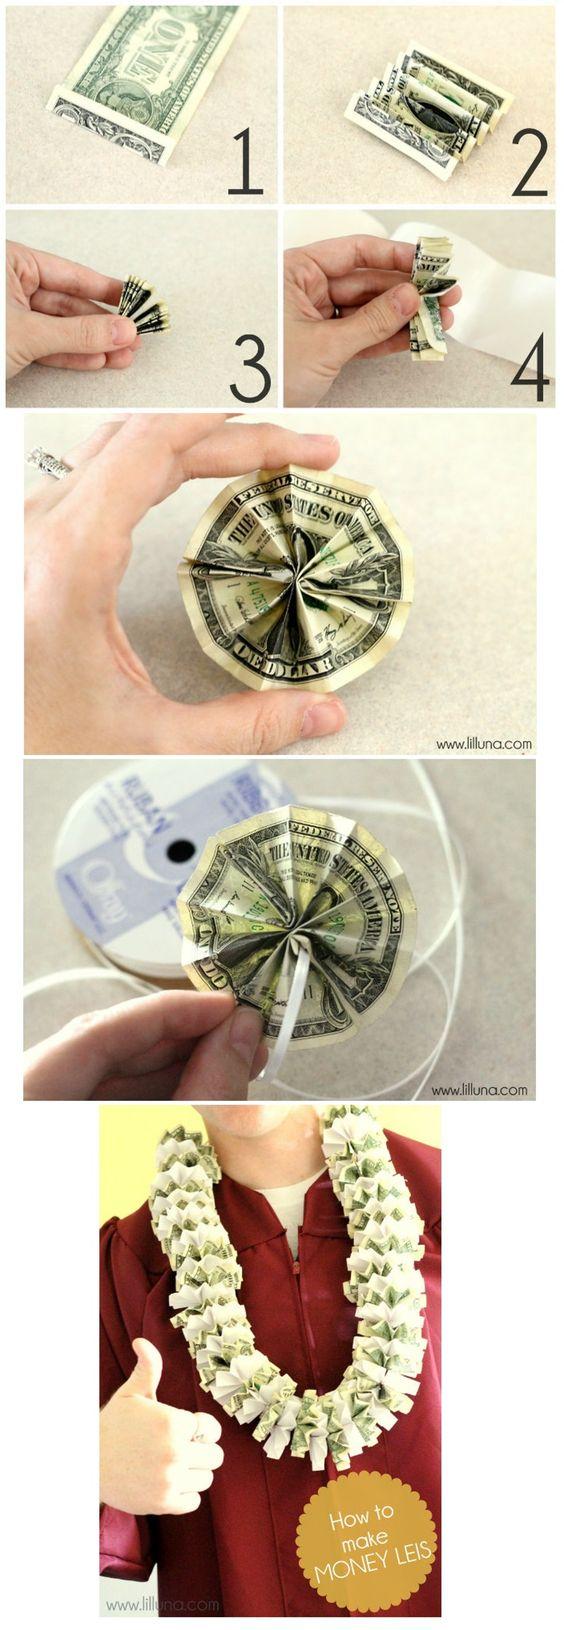 Diy tutorial leis how to make money leis money lei for Diy to make money